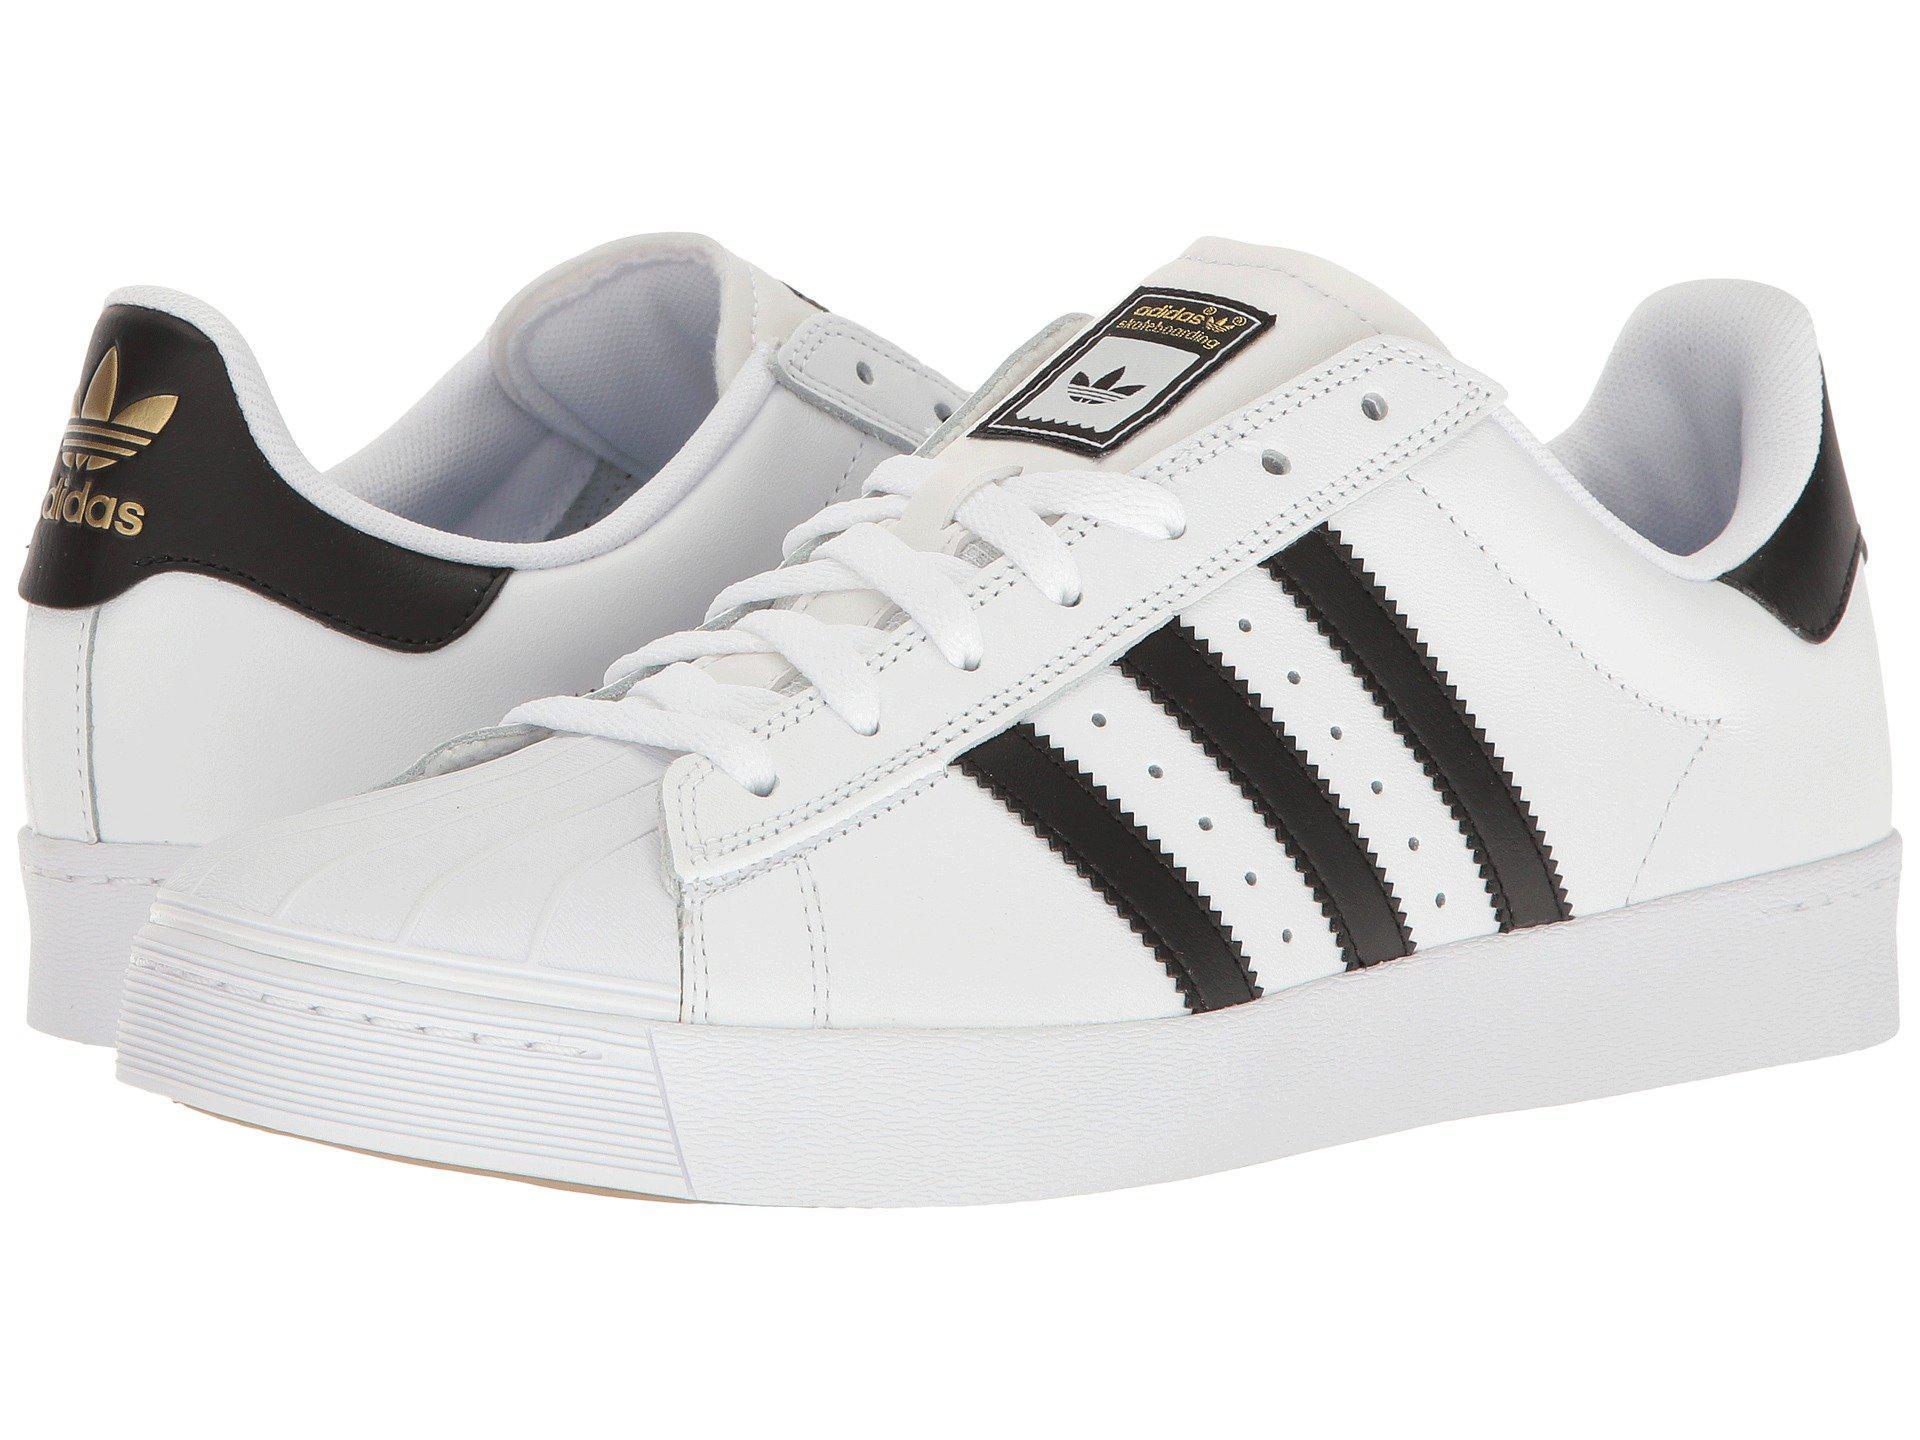 11163c4ea4c adidas Originals. Men s Superstar Vulc Adv (white black white) Skate Shoes